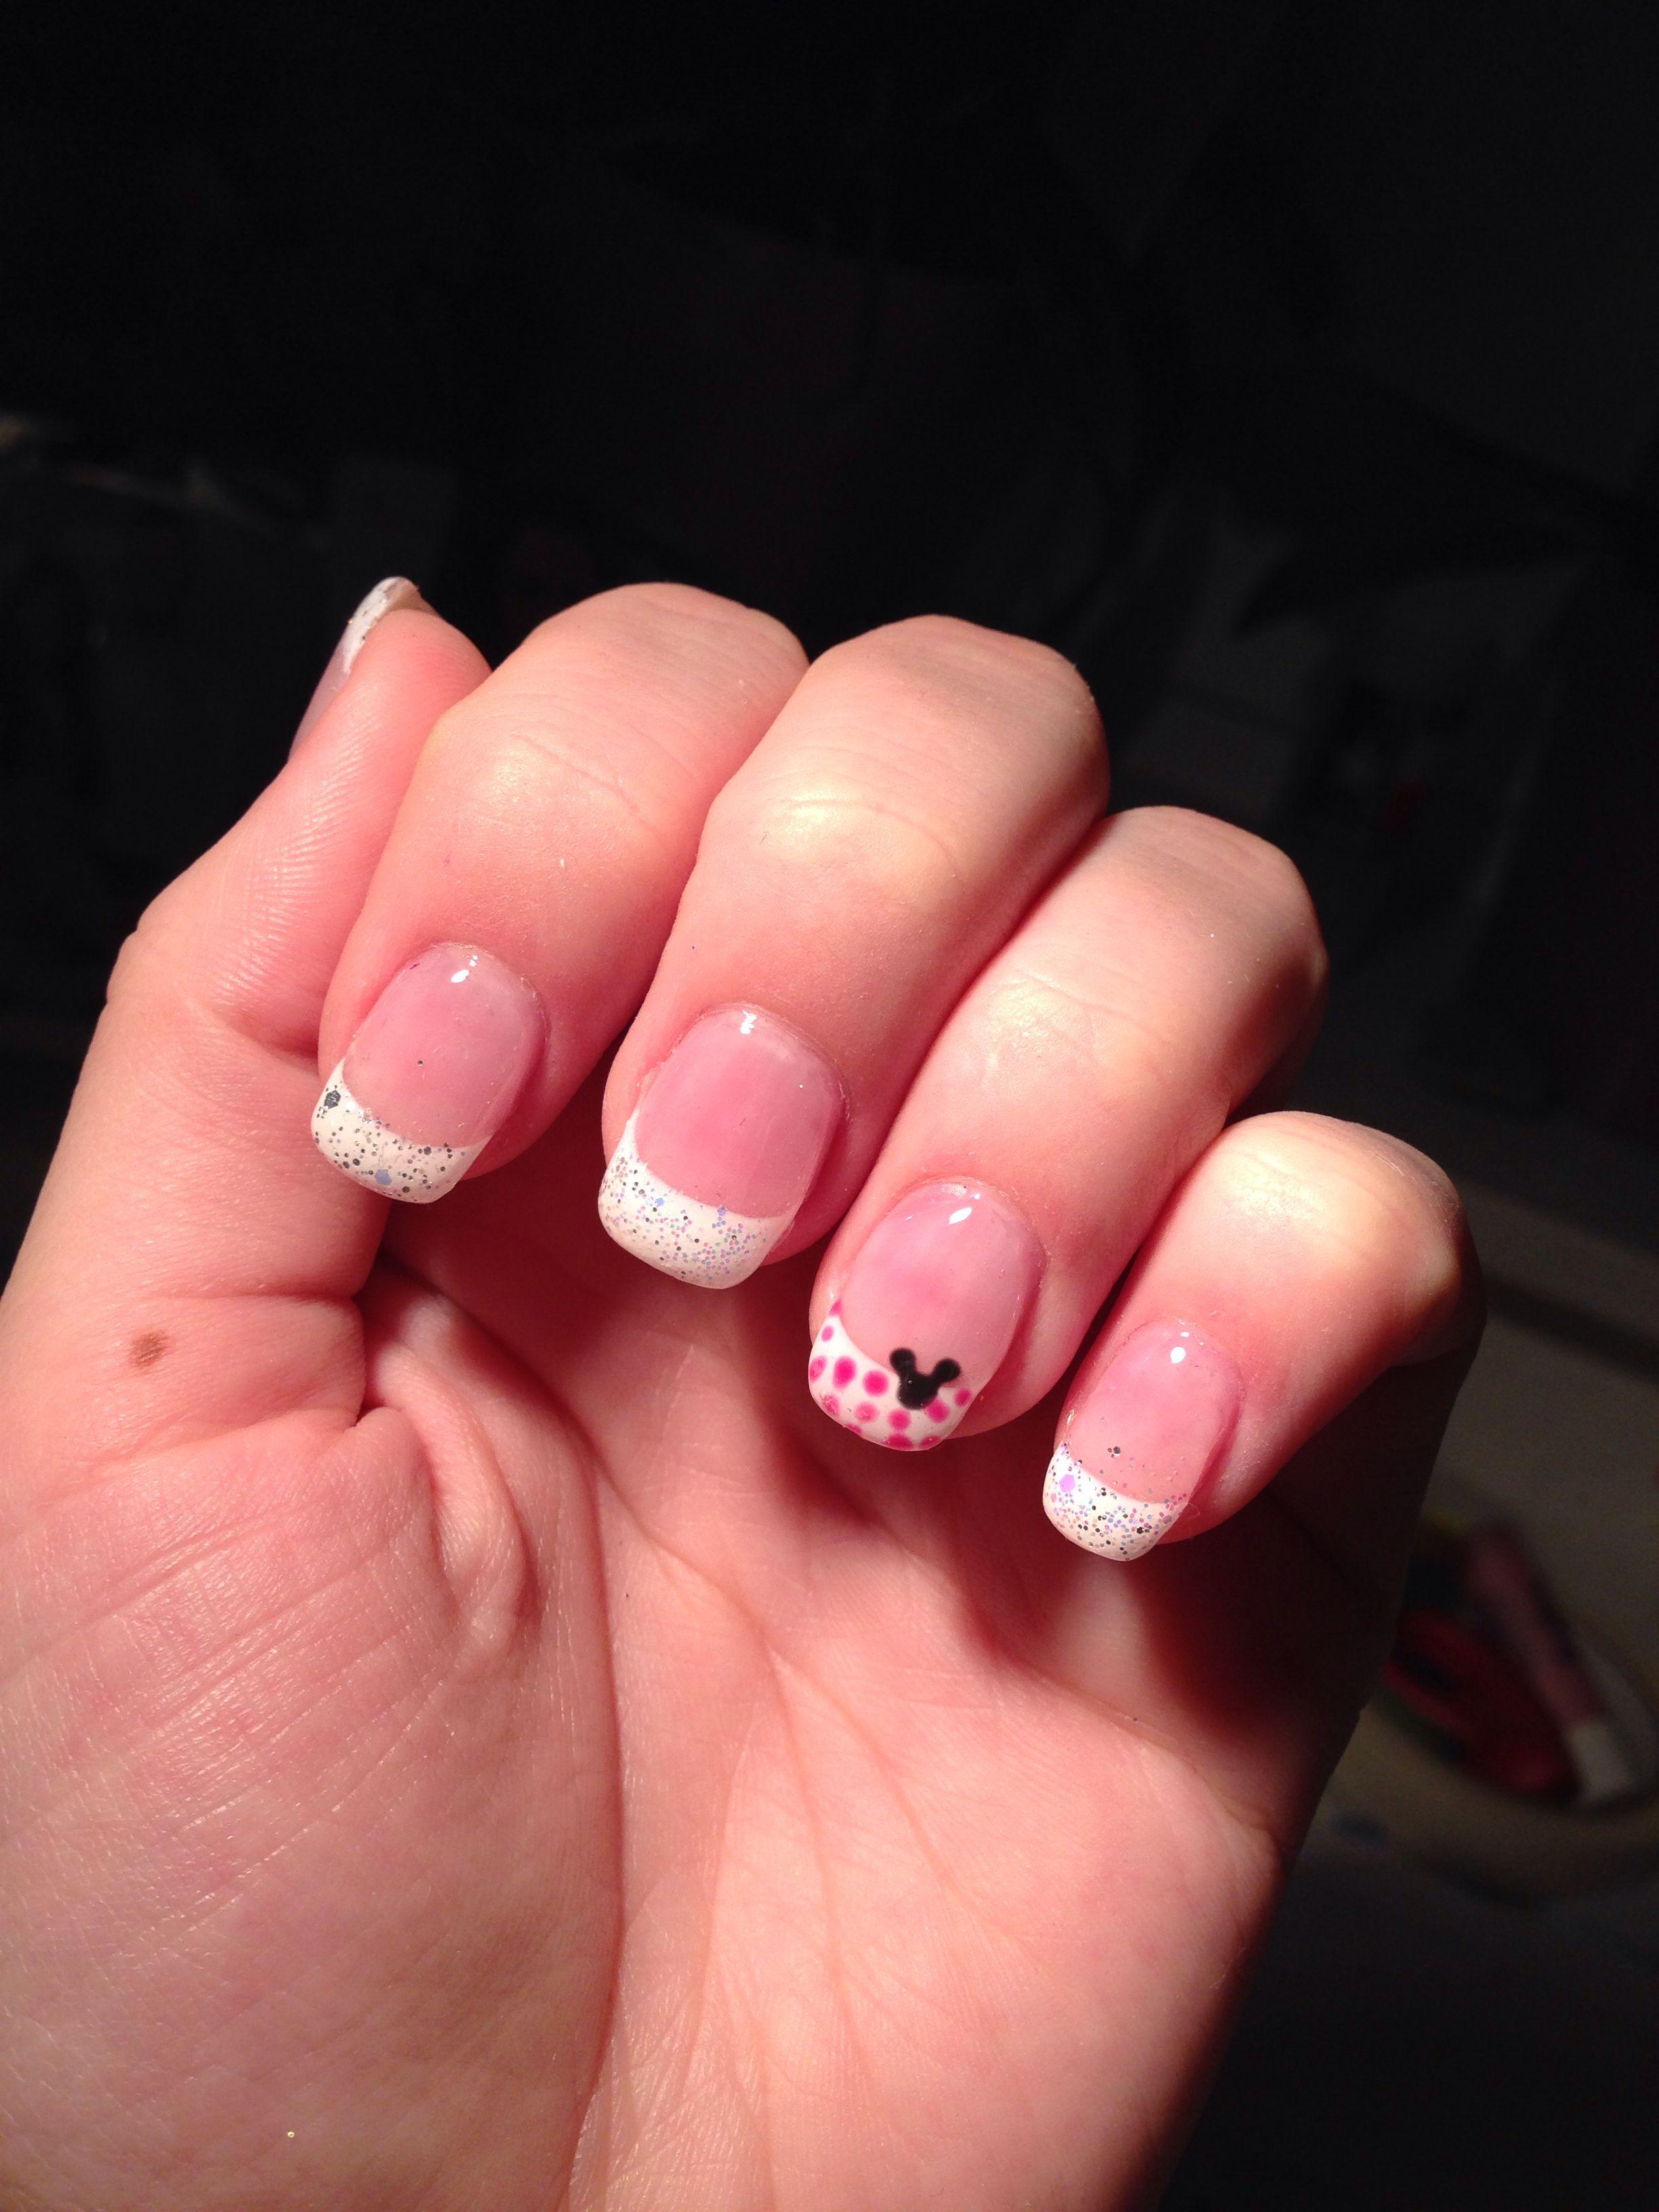 Mickey mouse nails 3.3.14 ; pretty nail shop gel | Nail ideas ...